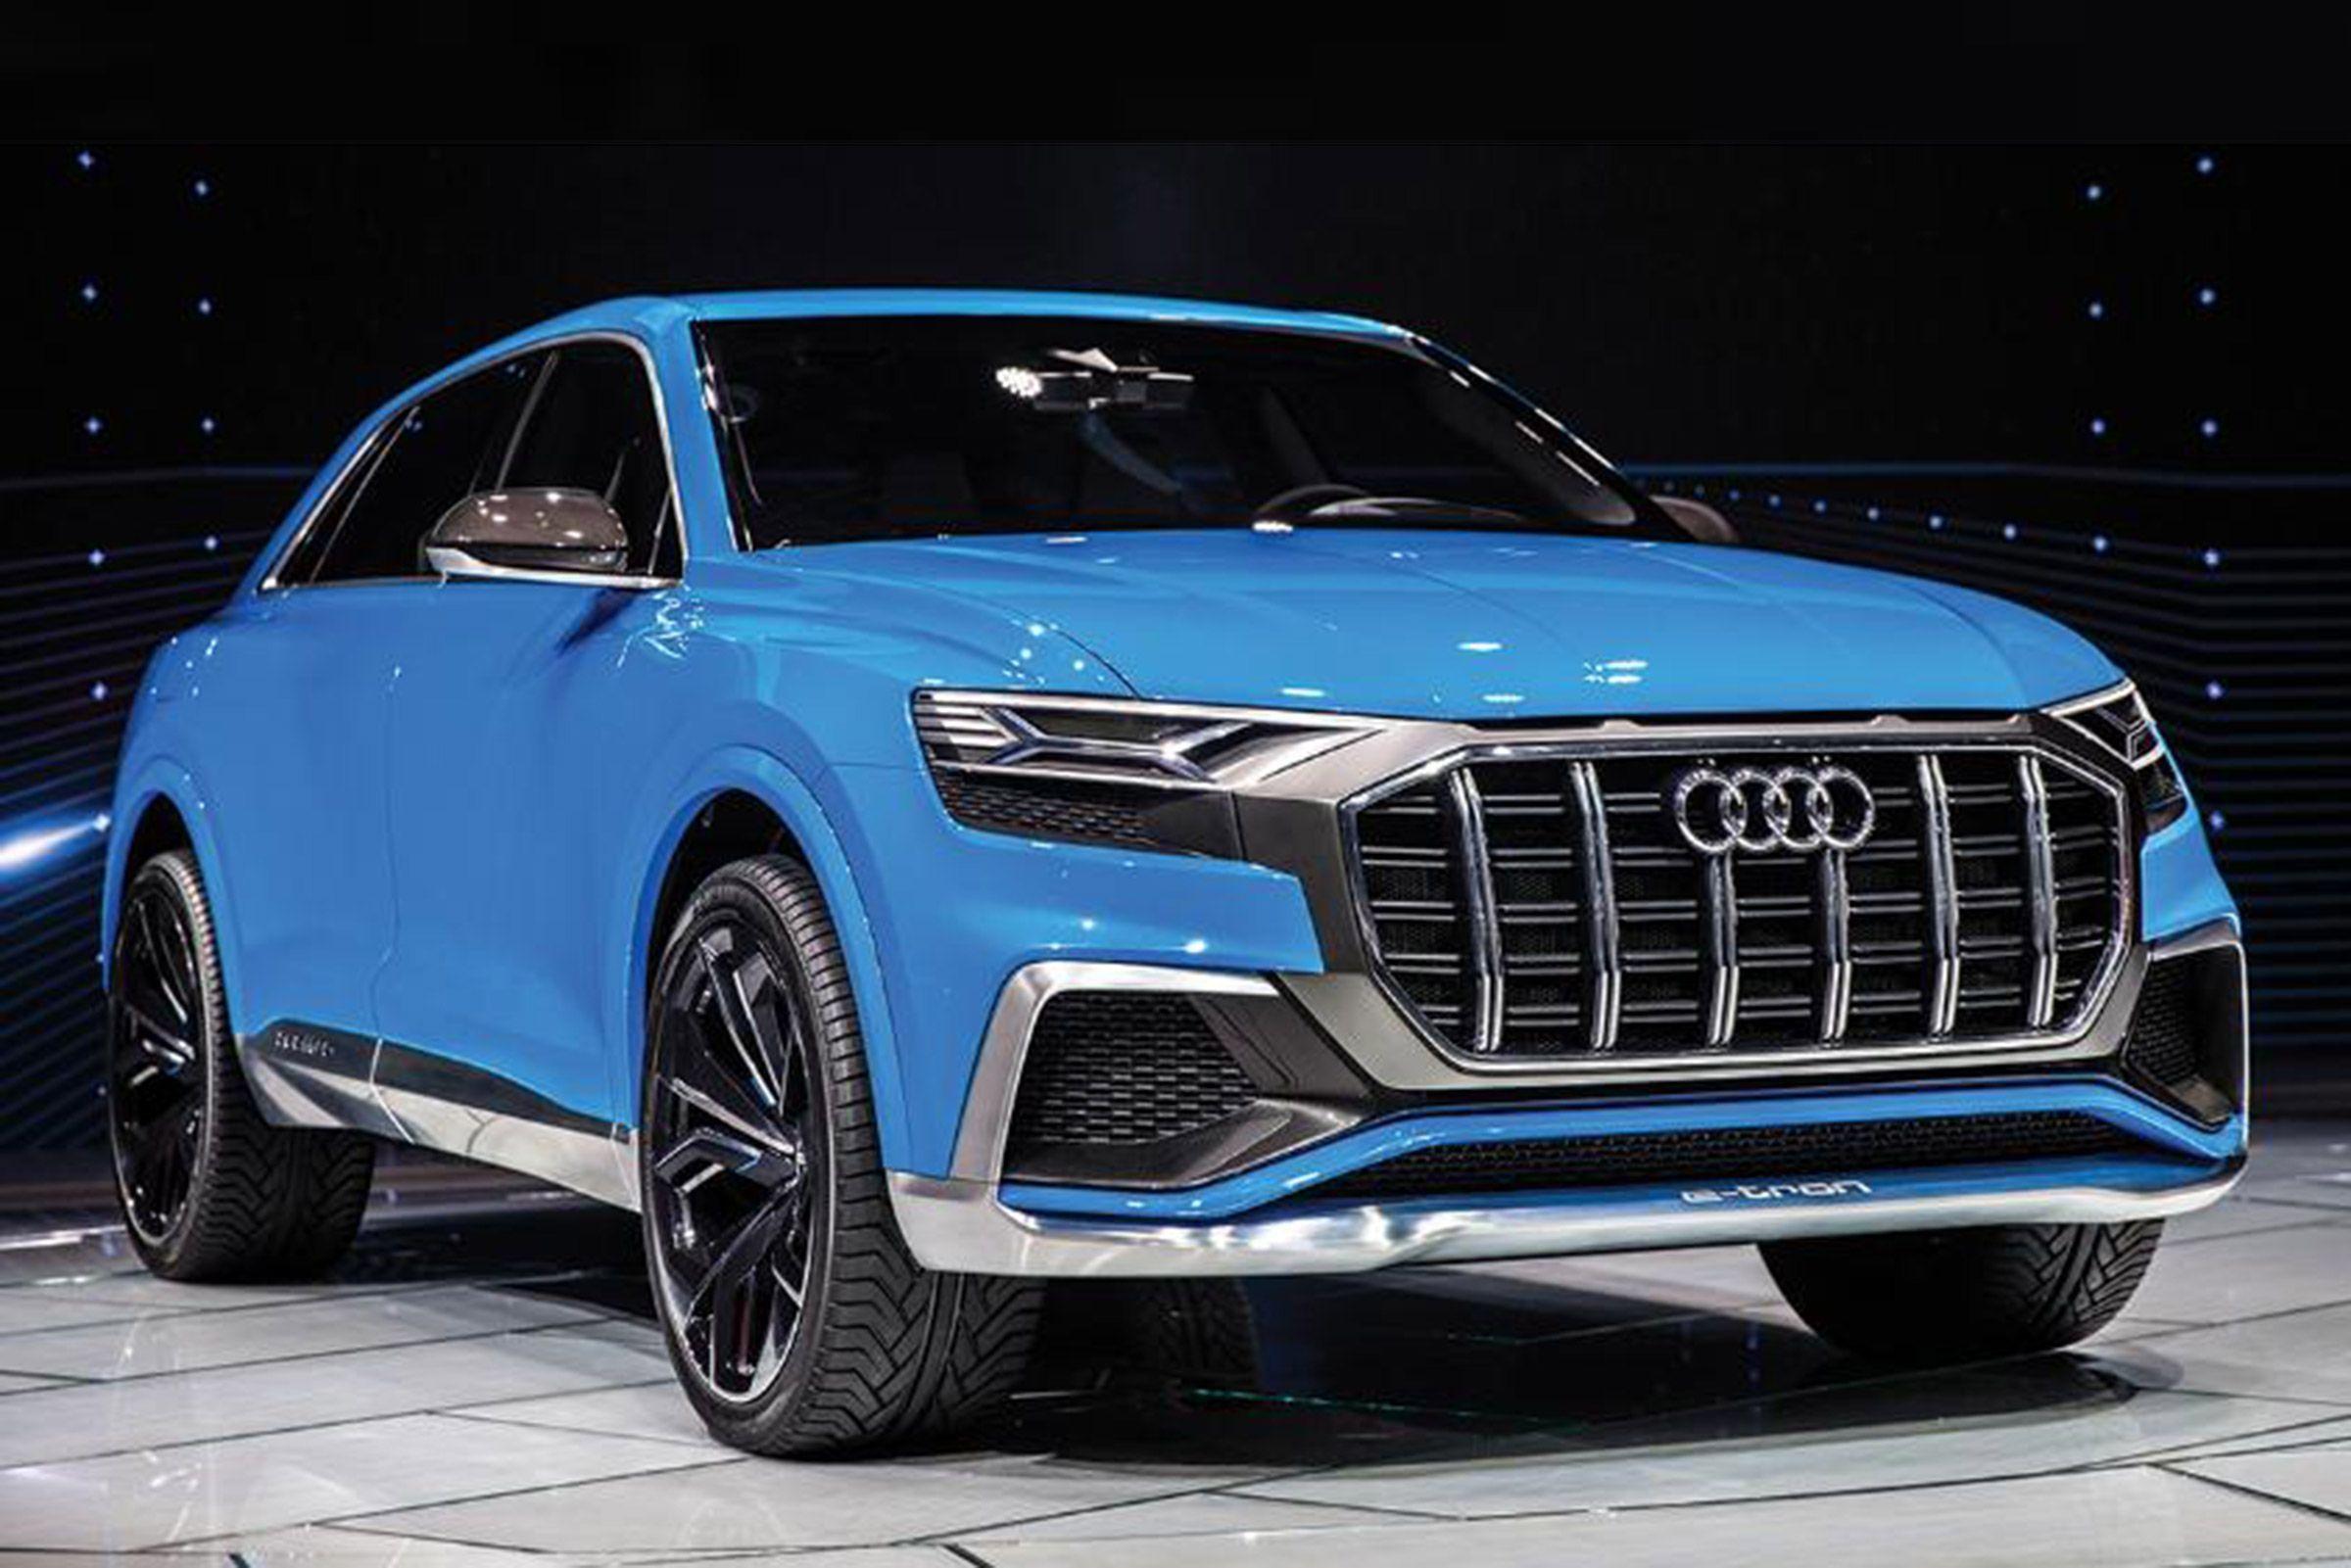 2018 Audi Q8 Exterior And Interior Review Cars Picture Audi 2017